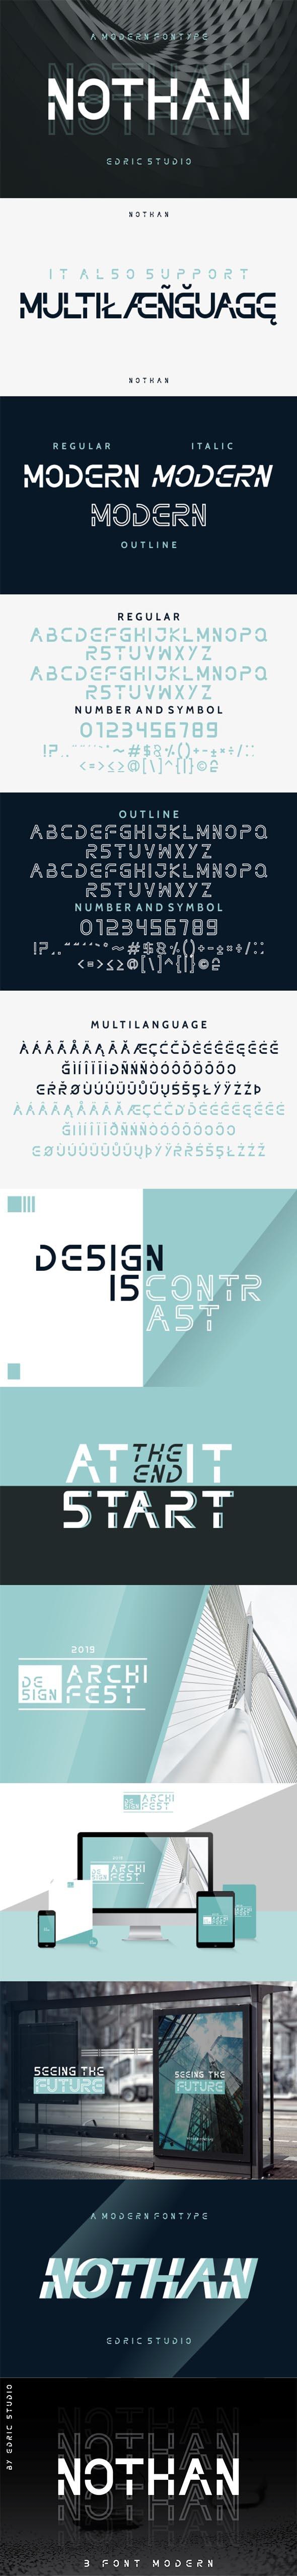 Nothan Futuristic Font - Futuristic Decorative